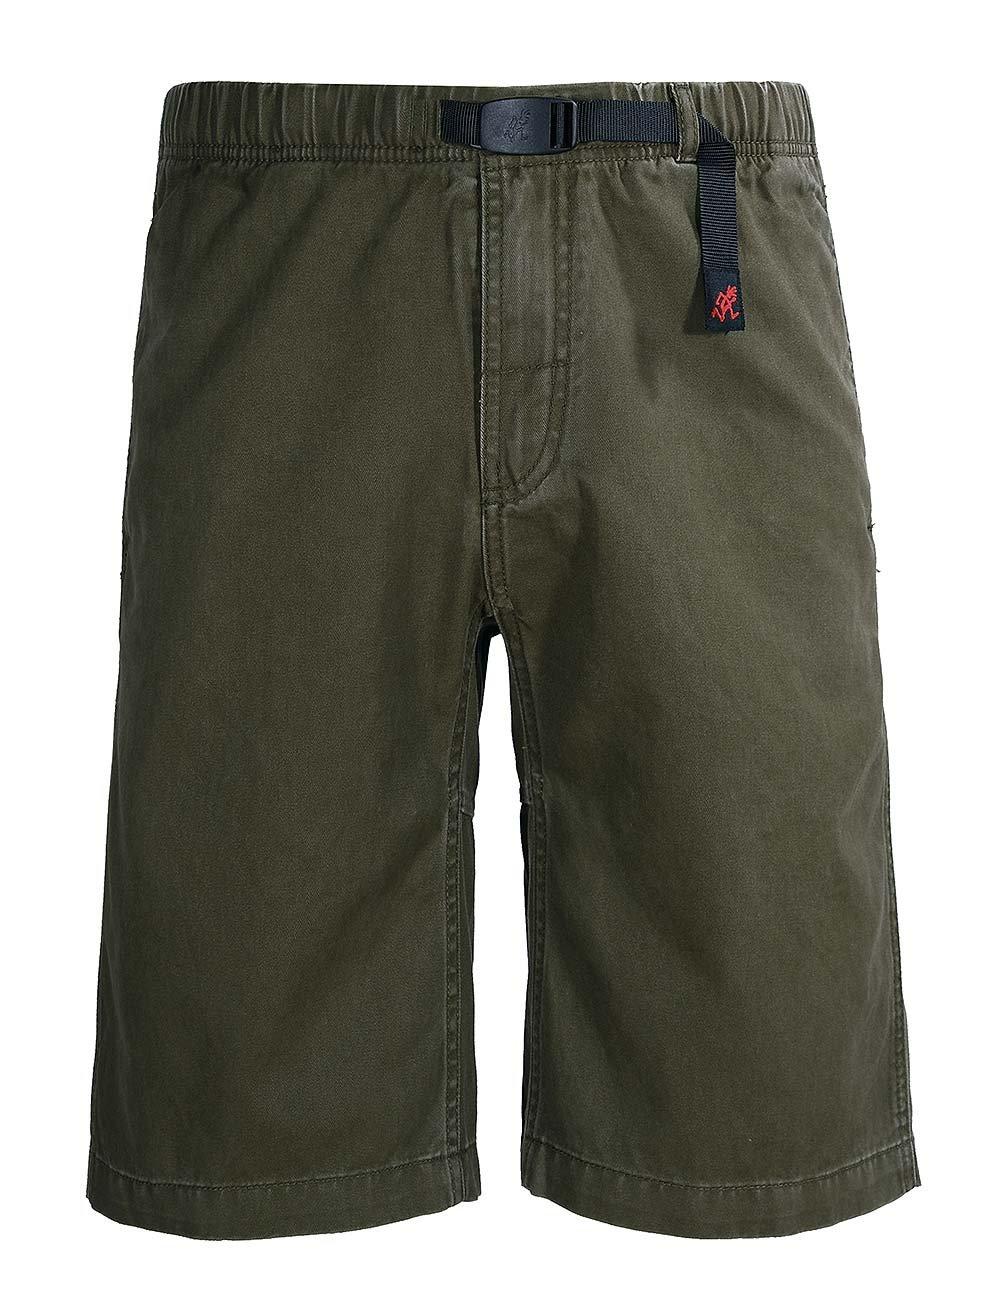 Gramicci Men's Rockin Sport Shorts, Olive